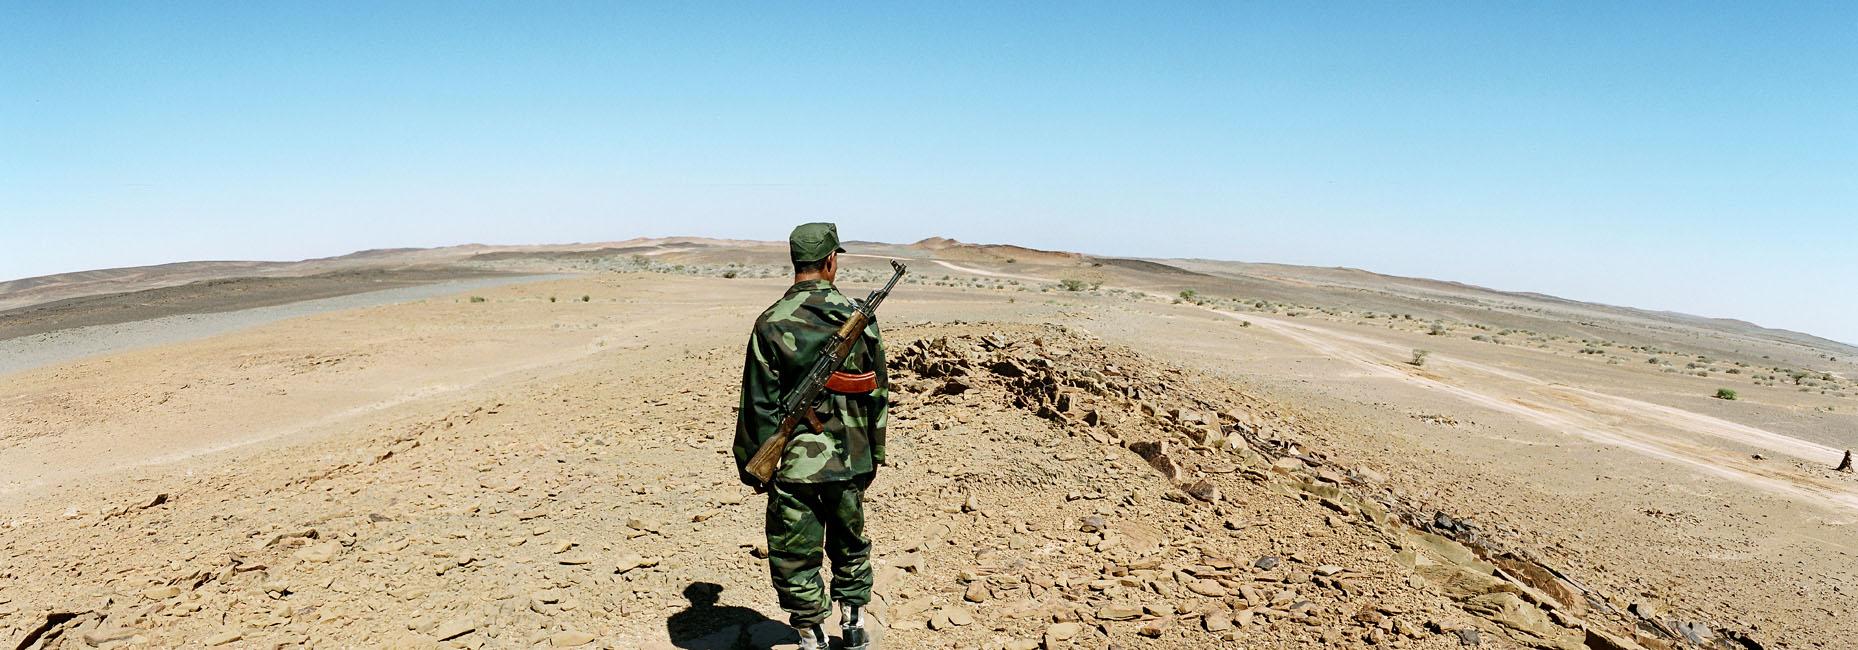 19_Polisario